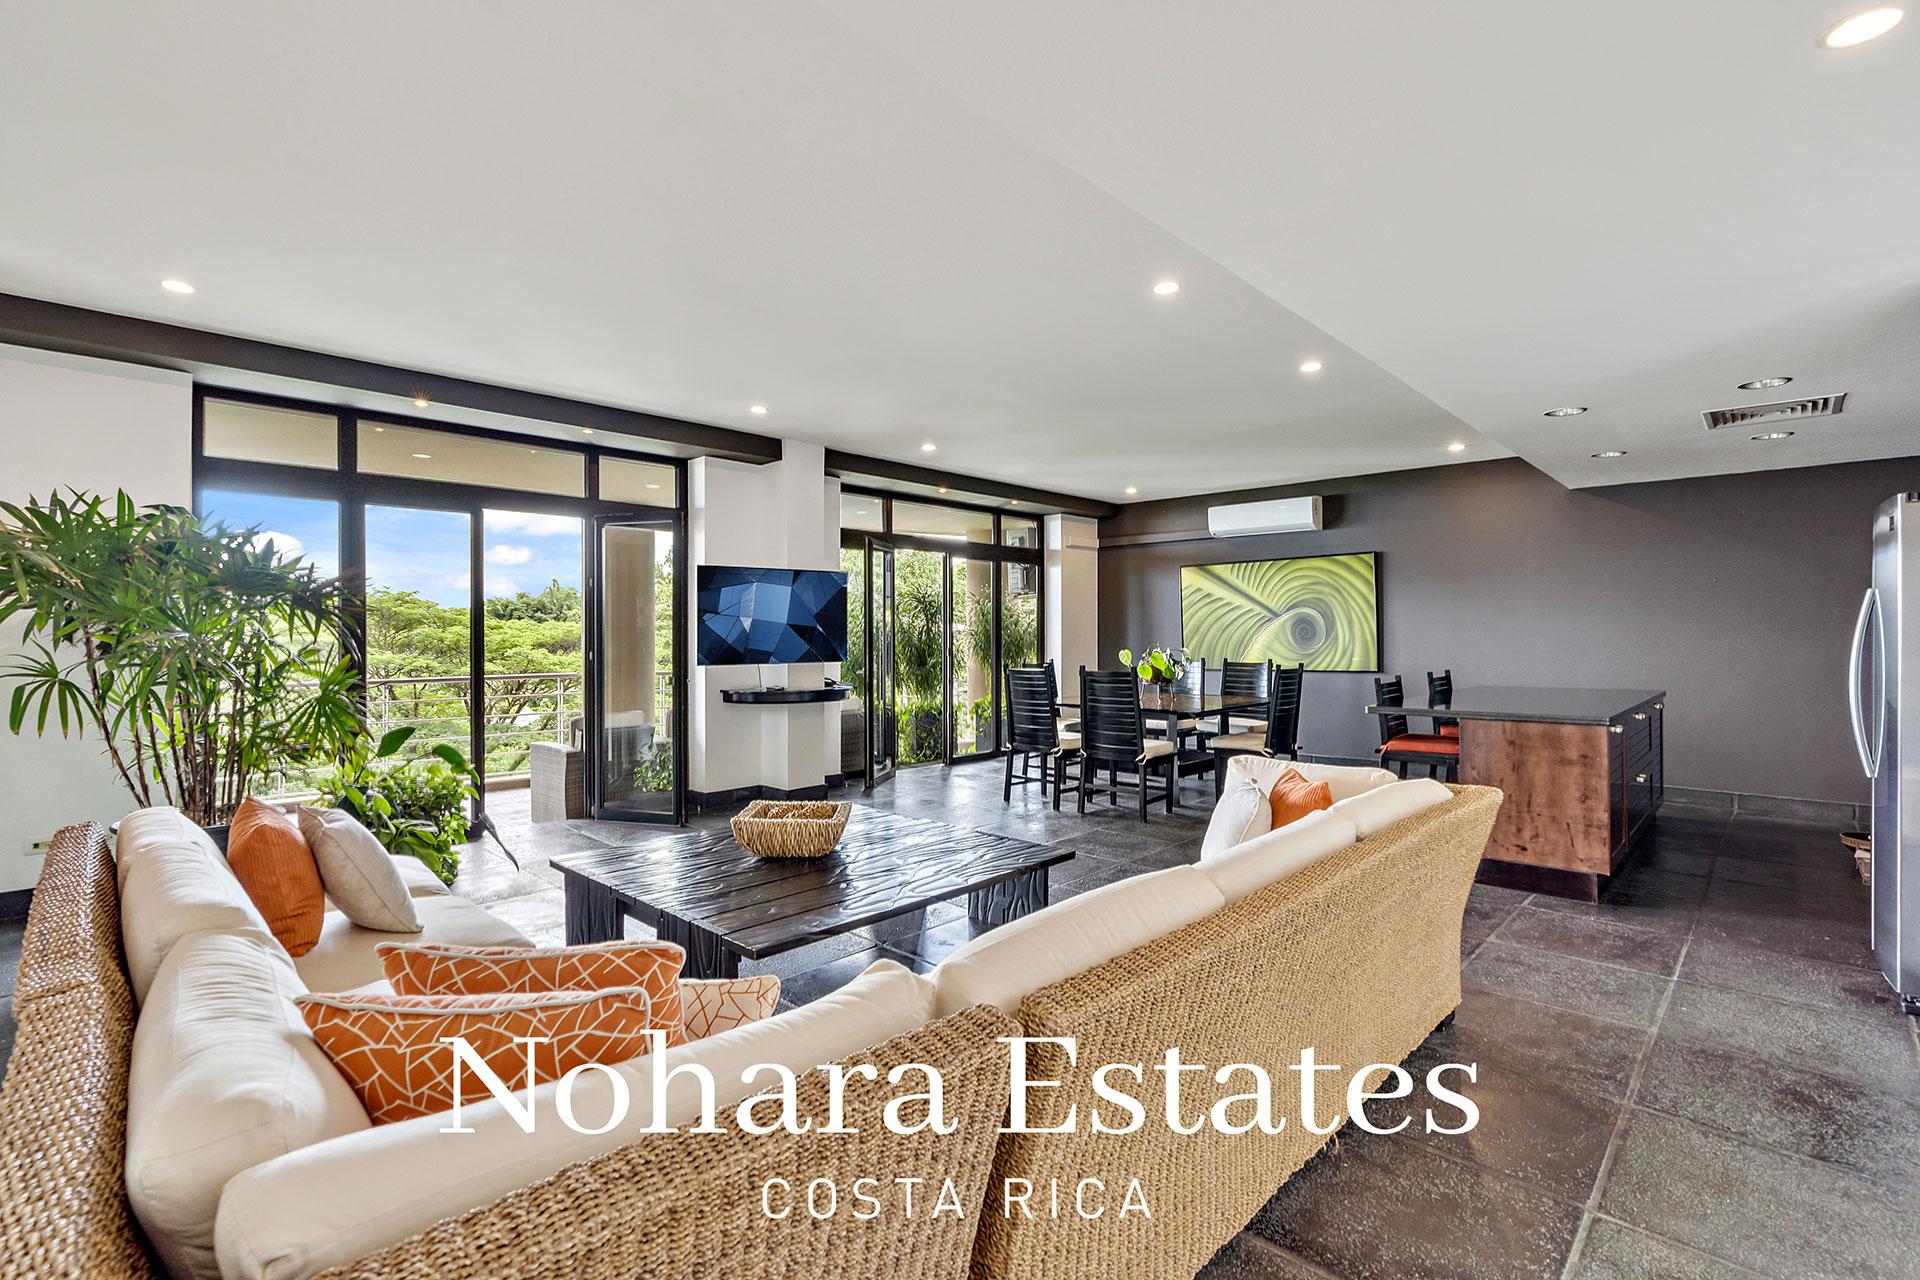 Nohara Estates Costa Rica 128 Penthouse Quepos Los Altos 24